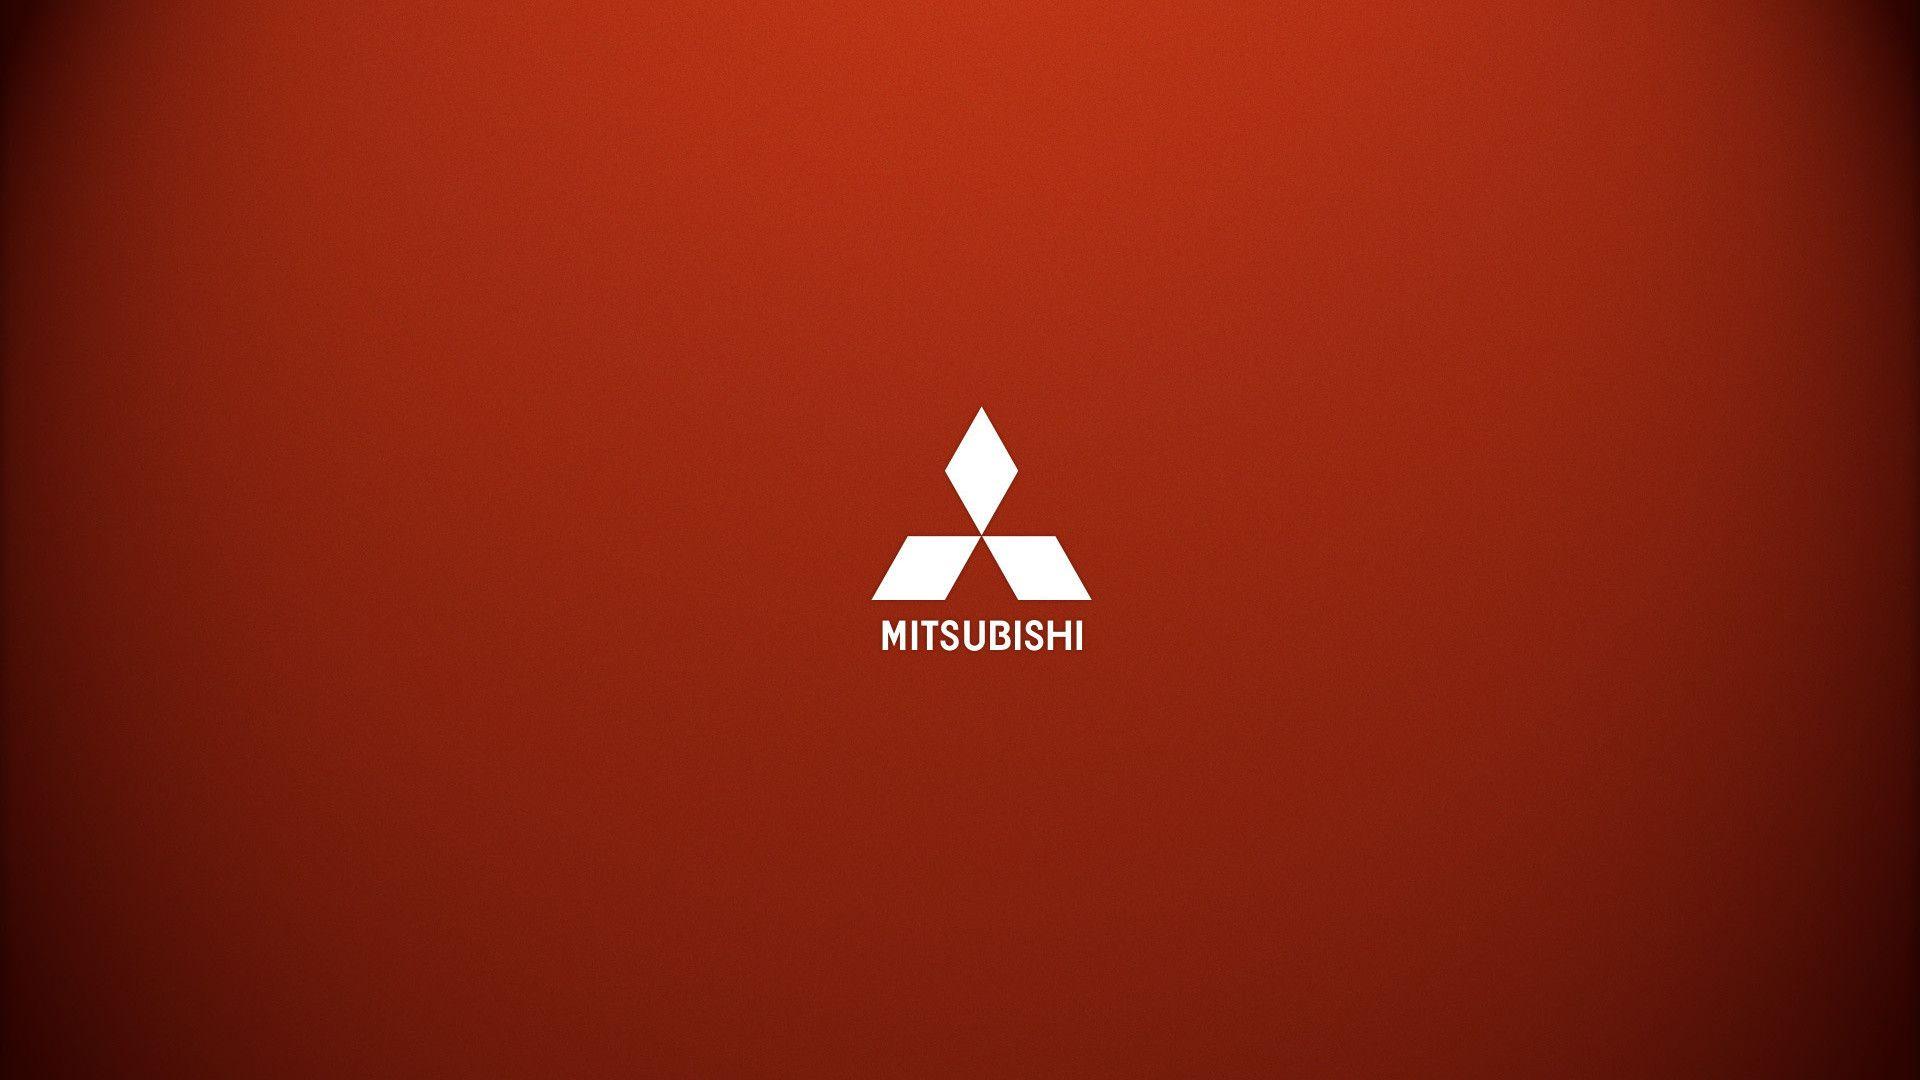 Mitsubishi Logo Hd Wallpaper Mitsubishi Car Brands Logos Wallpaper